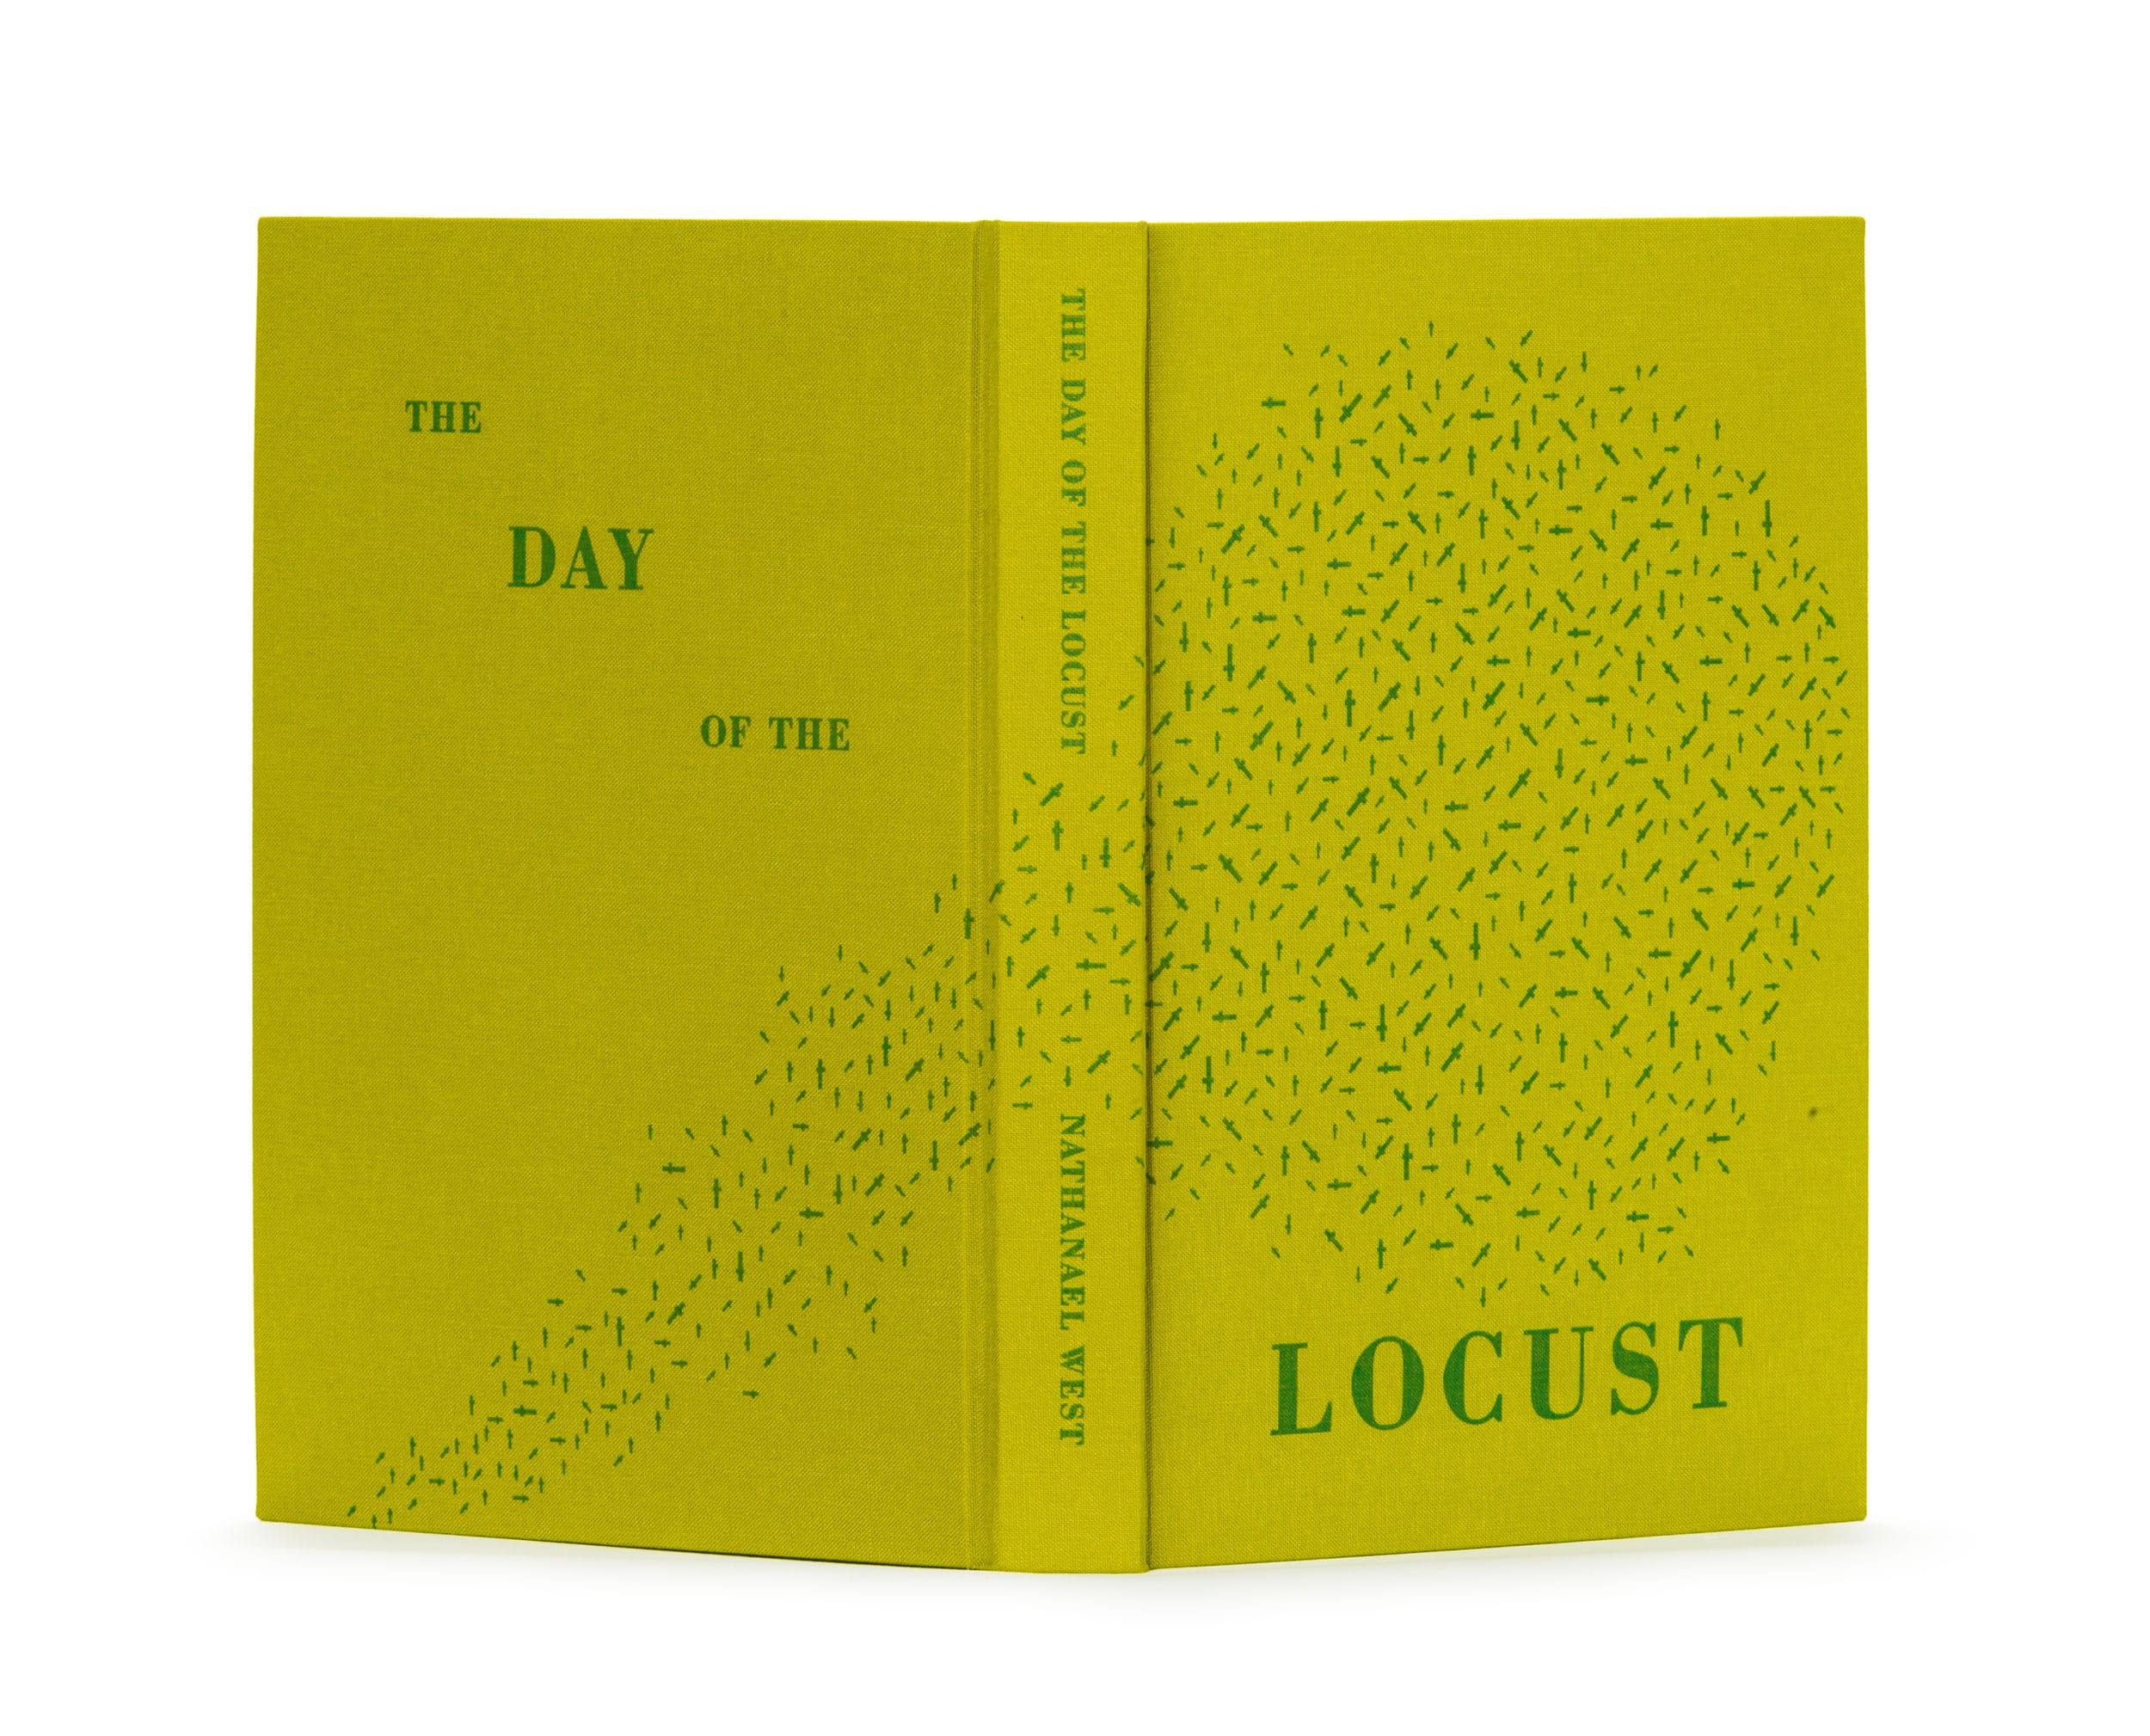 097_The_Day_of_The_Locust-Binding-fix.jpg